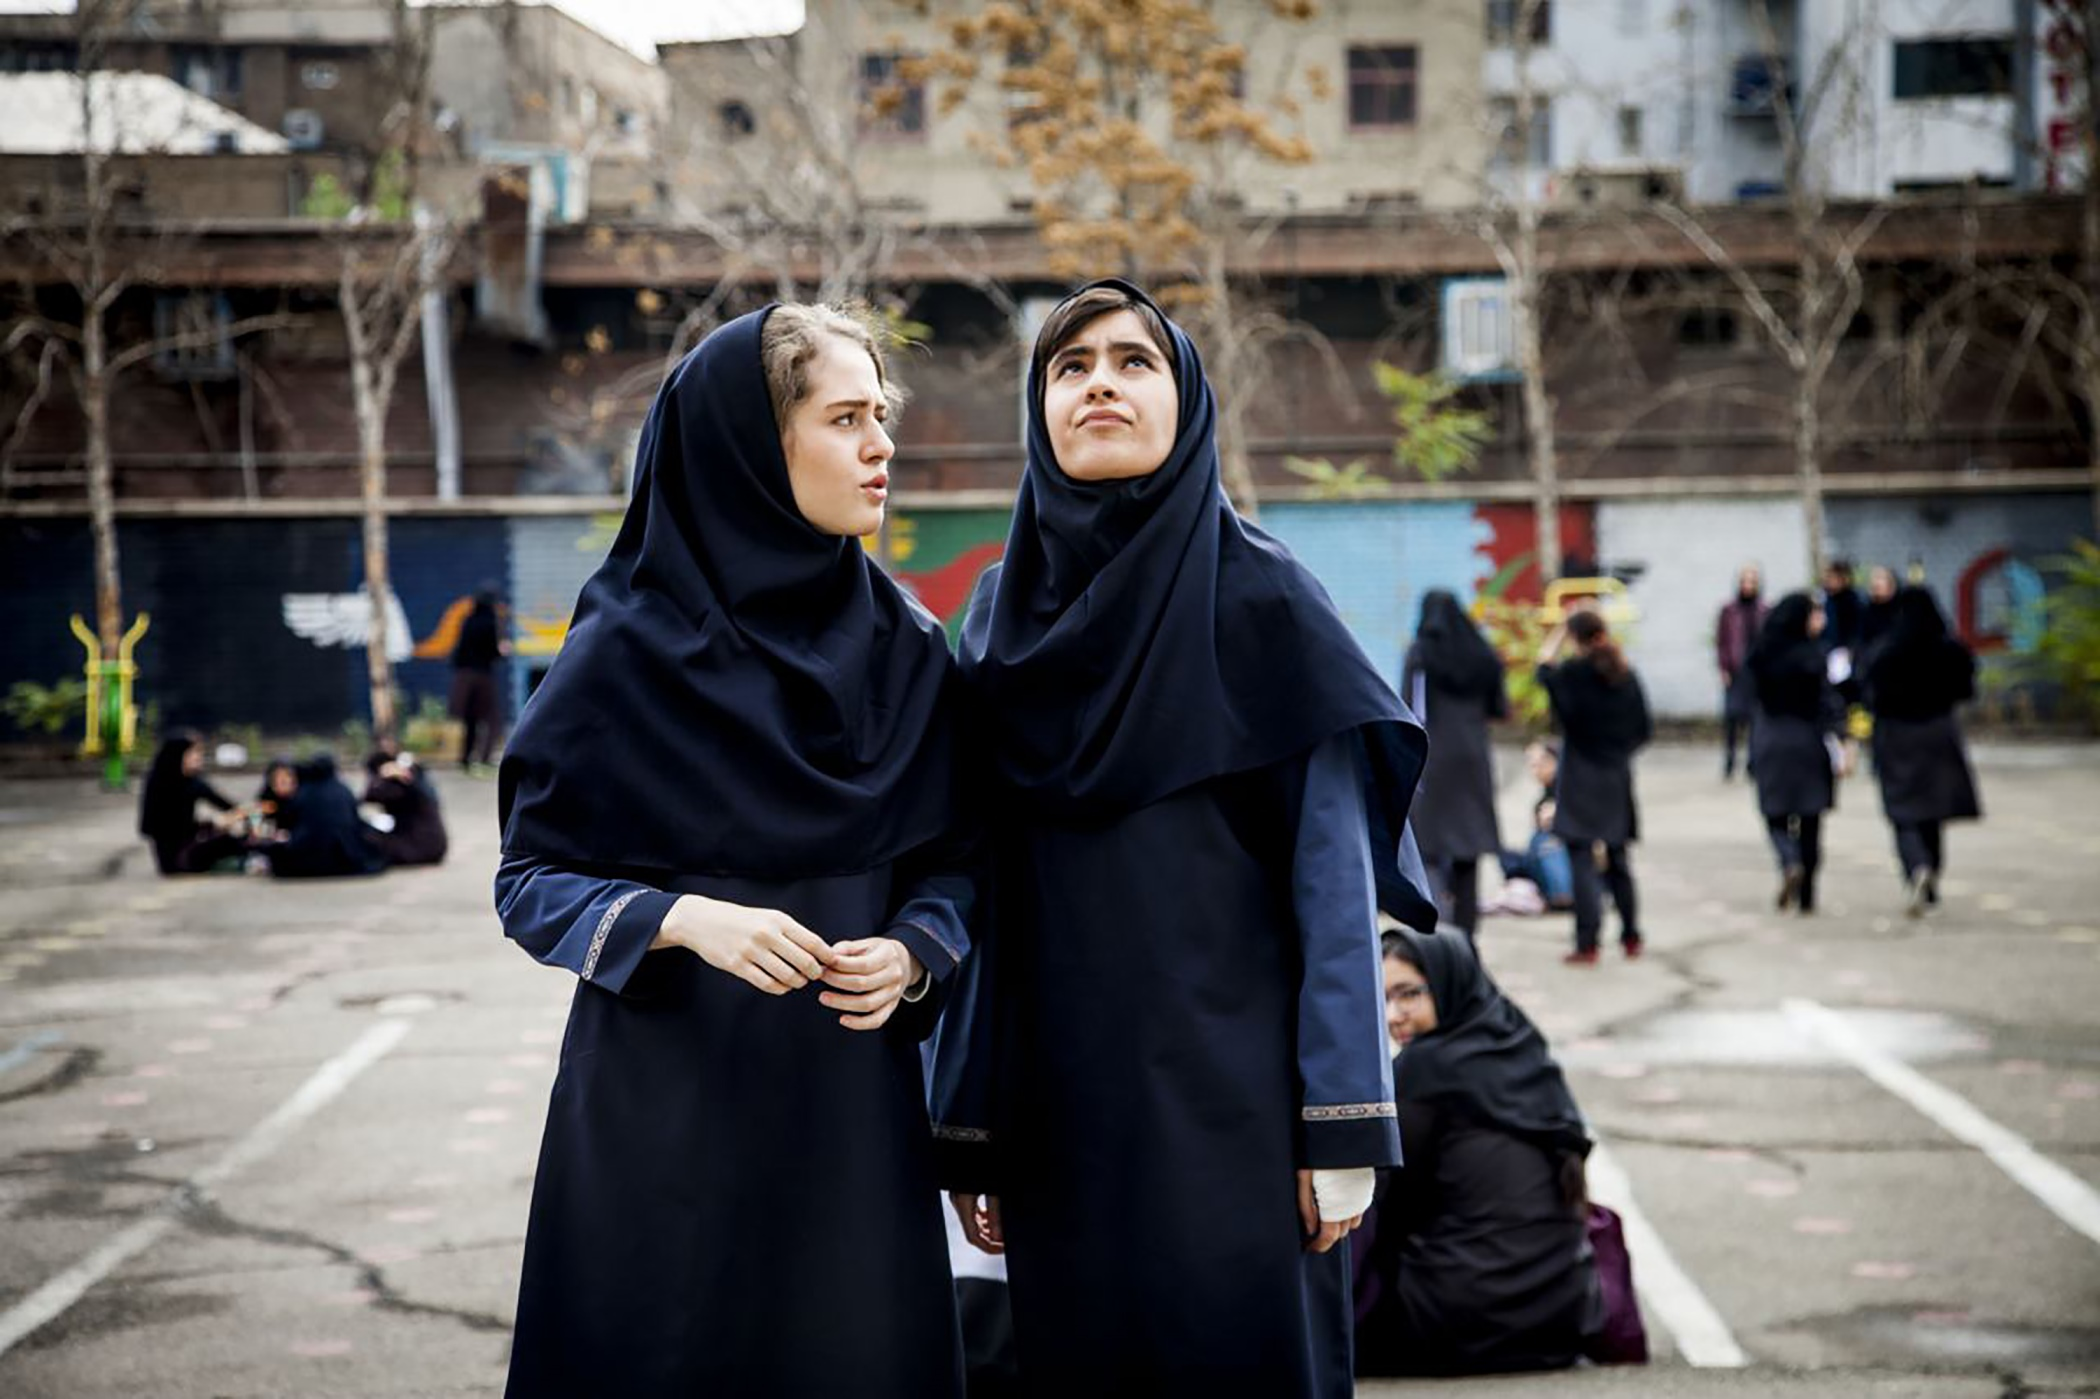 Jerusalem Film Festival 2018: Debut Films   MidnightEast